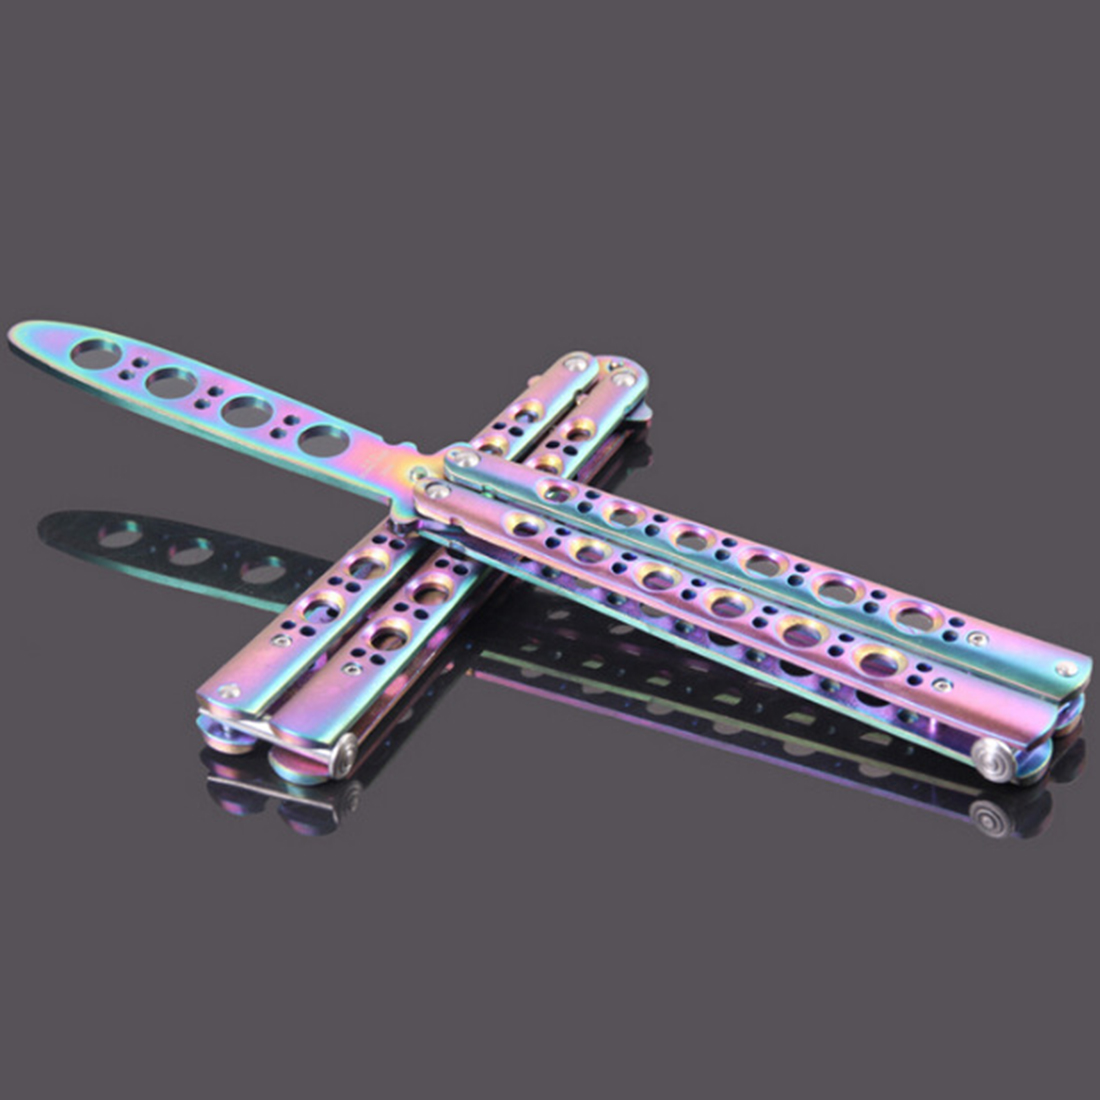 Купить с кэшбэком Titanium Rainbow color Stainless Steel knife Butterfly Training Knife Folding Butterfly Knife Game Knife Dull Tool